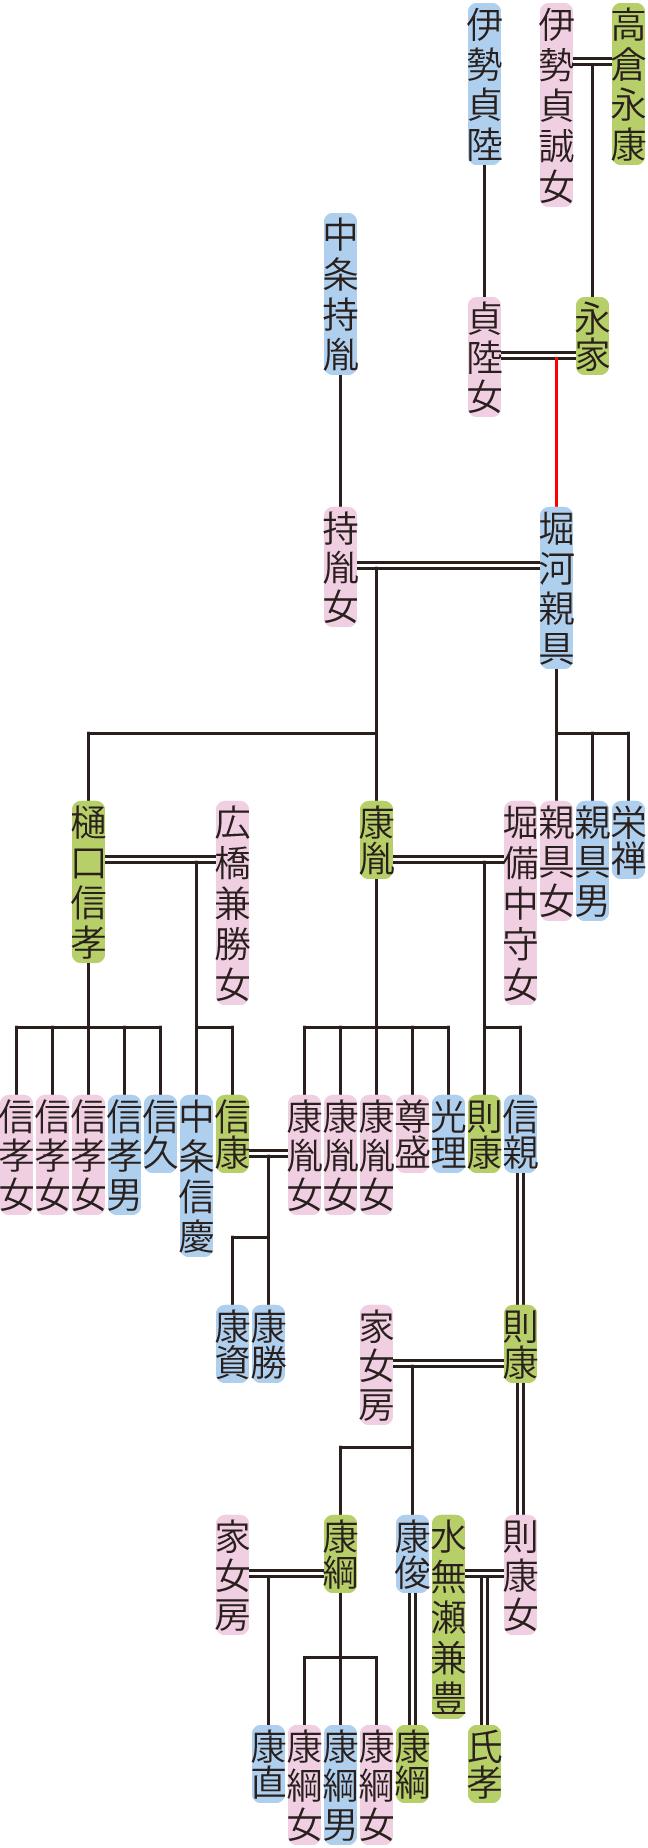 堀河親具~則康の系図